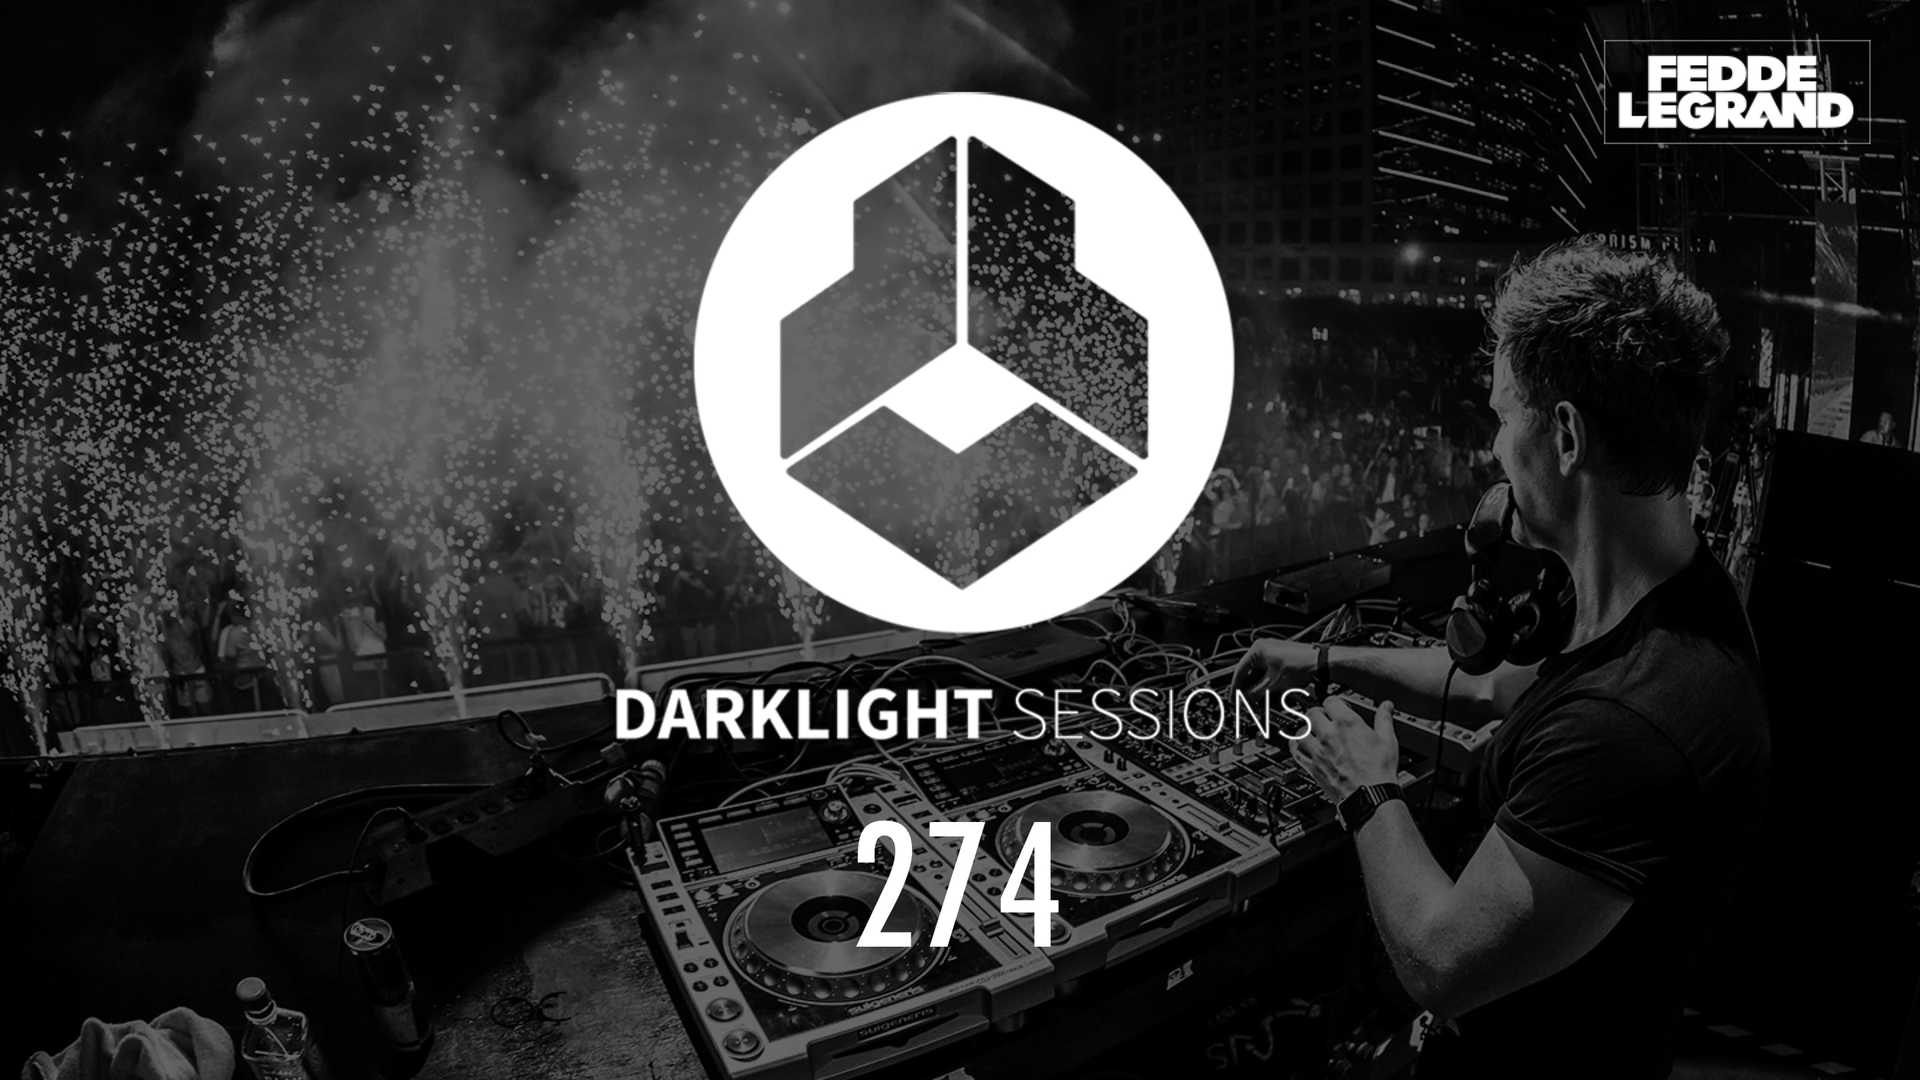 Darklight Sessions 274